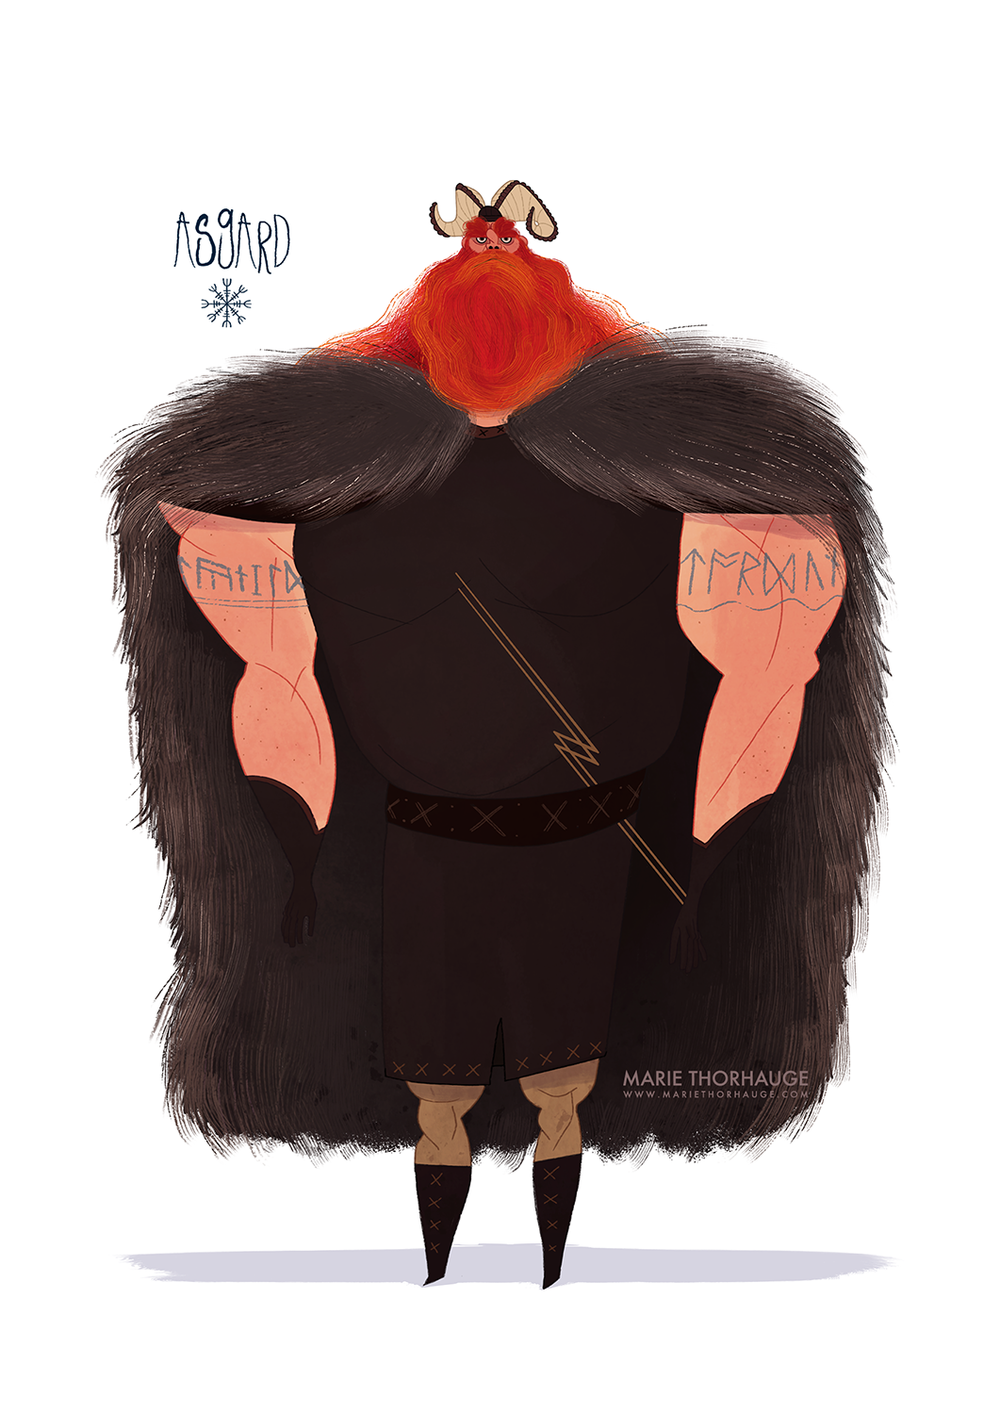 2015_Marie-Thorhauge_Asgard_Thor.png